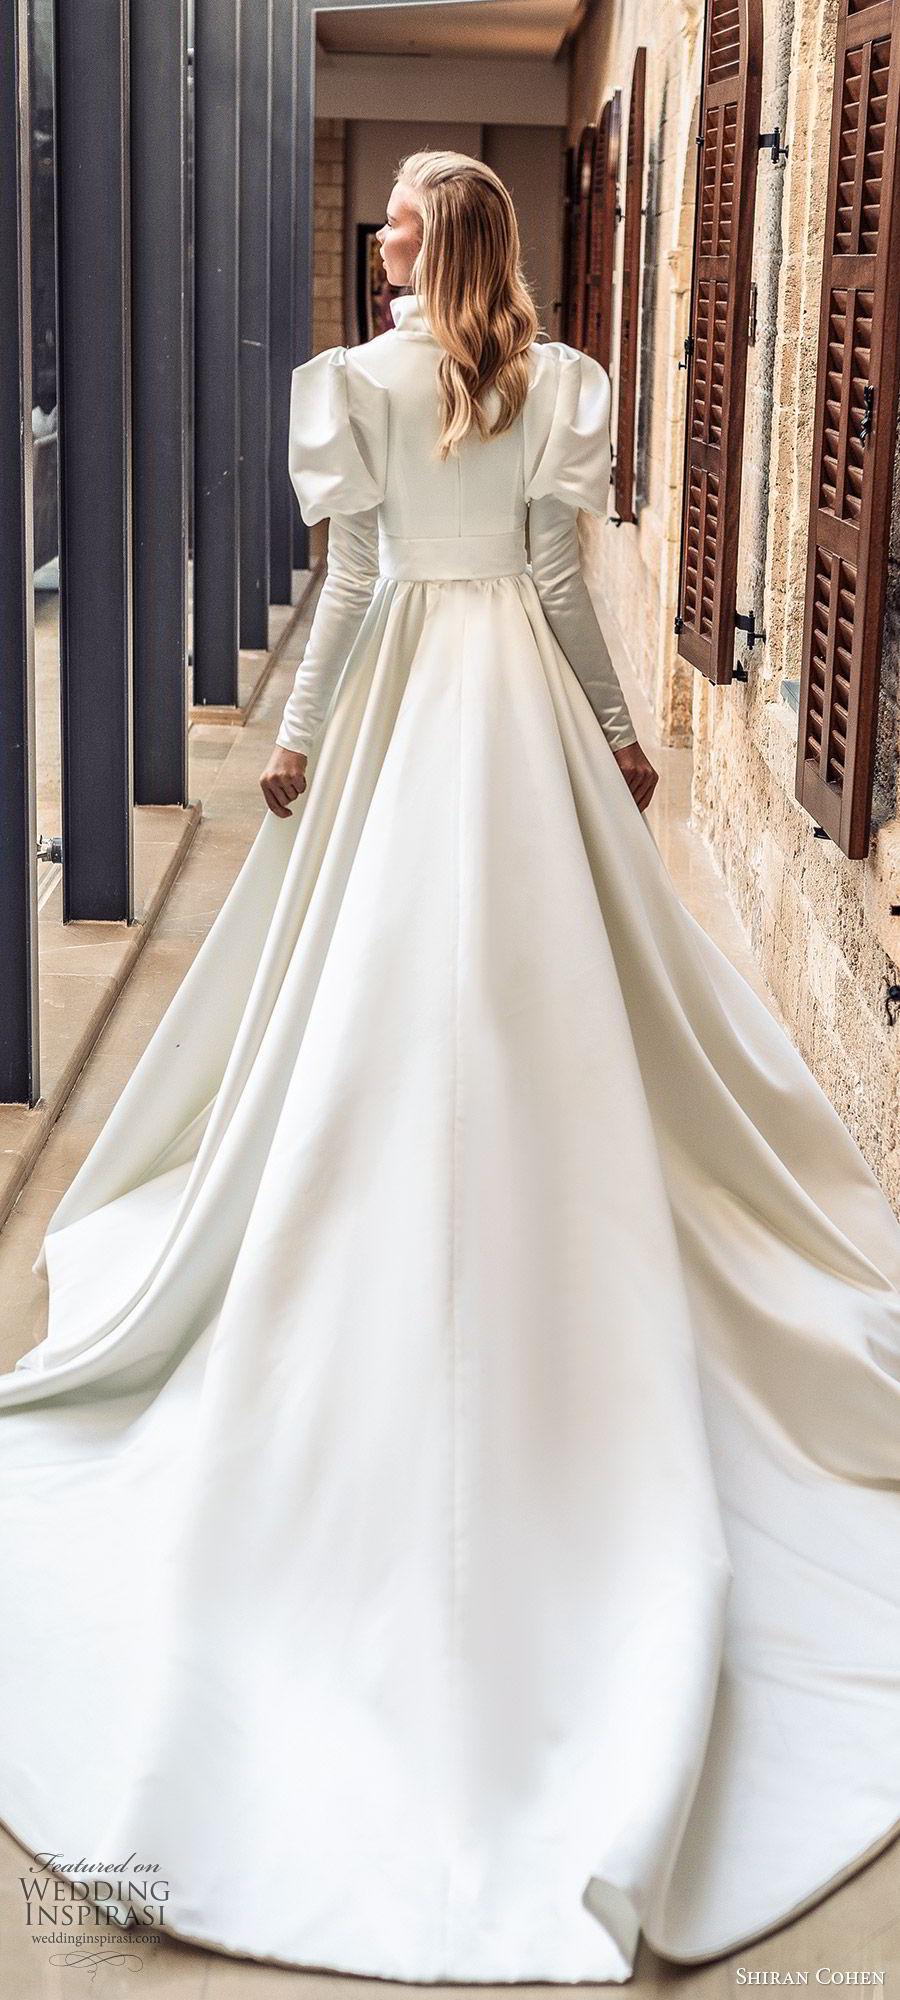 shiran cohen 2019 bridal mutton sleeves plunging v neckline collar belt a line ball gown wedding dress chapel train romantic princess clean modern (5) zbv